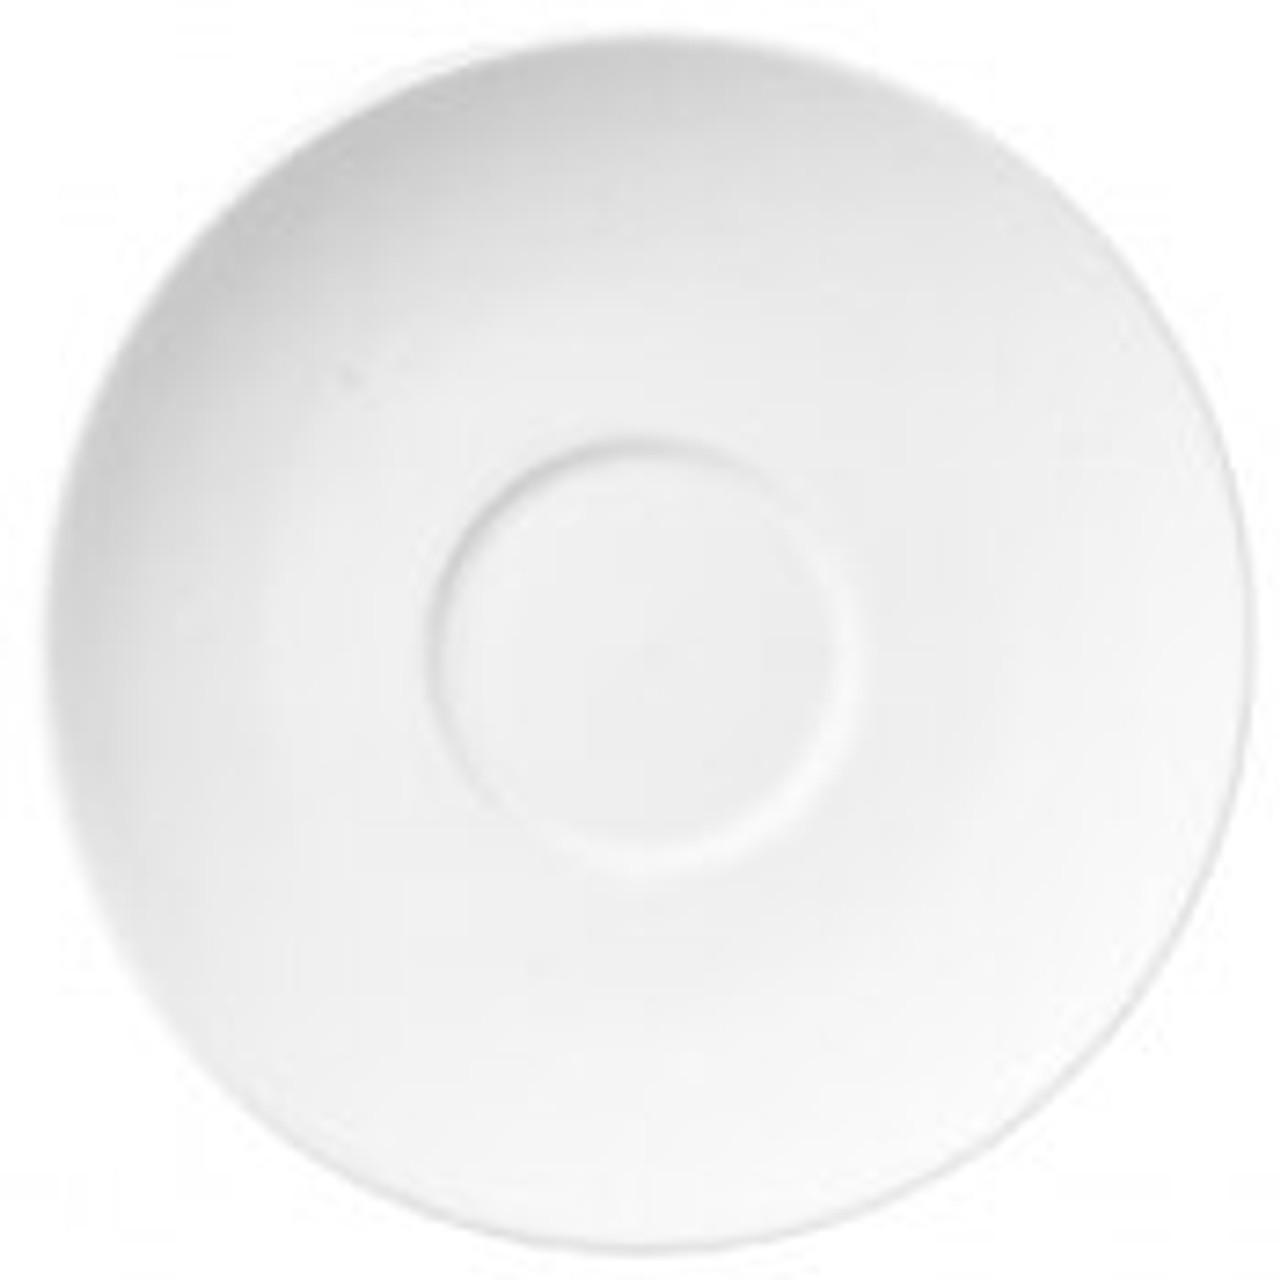 "Revolution Revware Saucer, 4.5"", white"